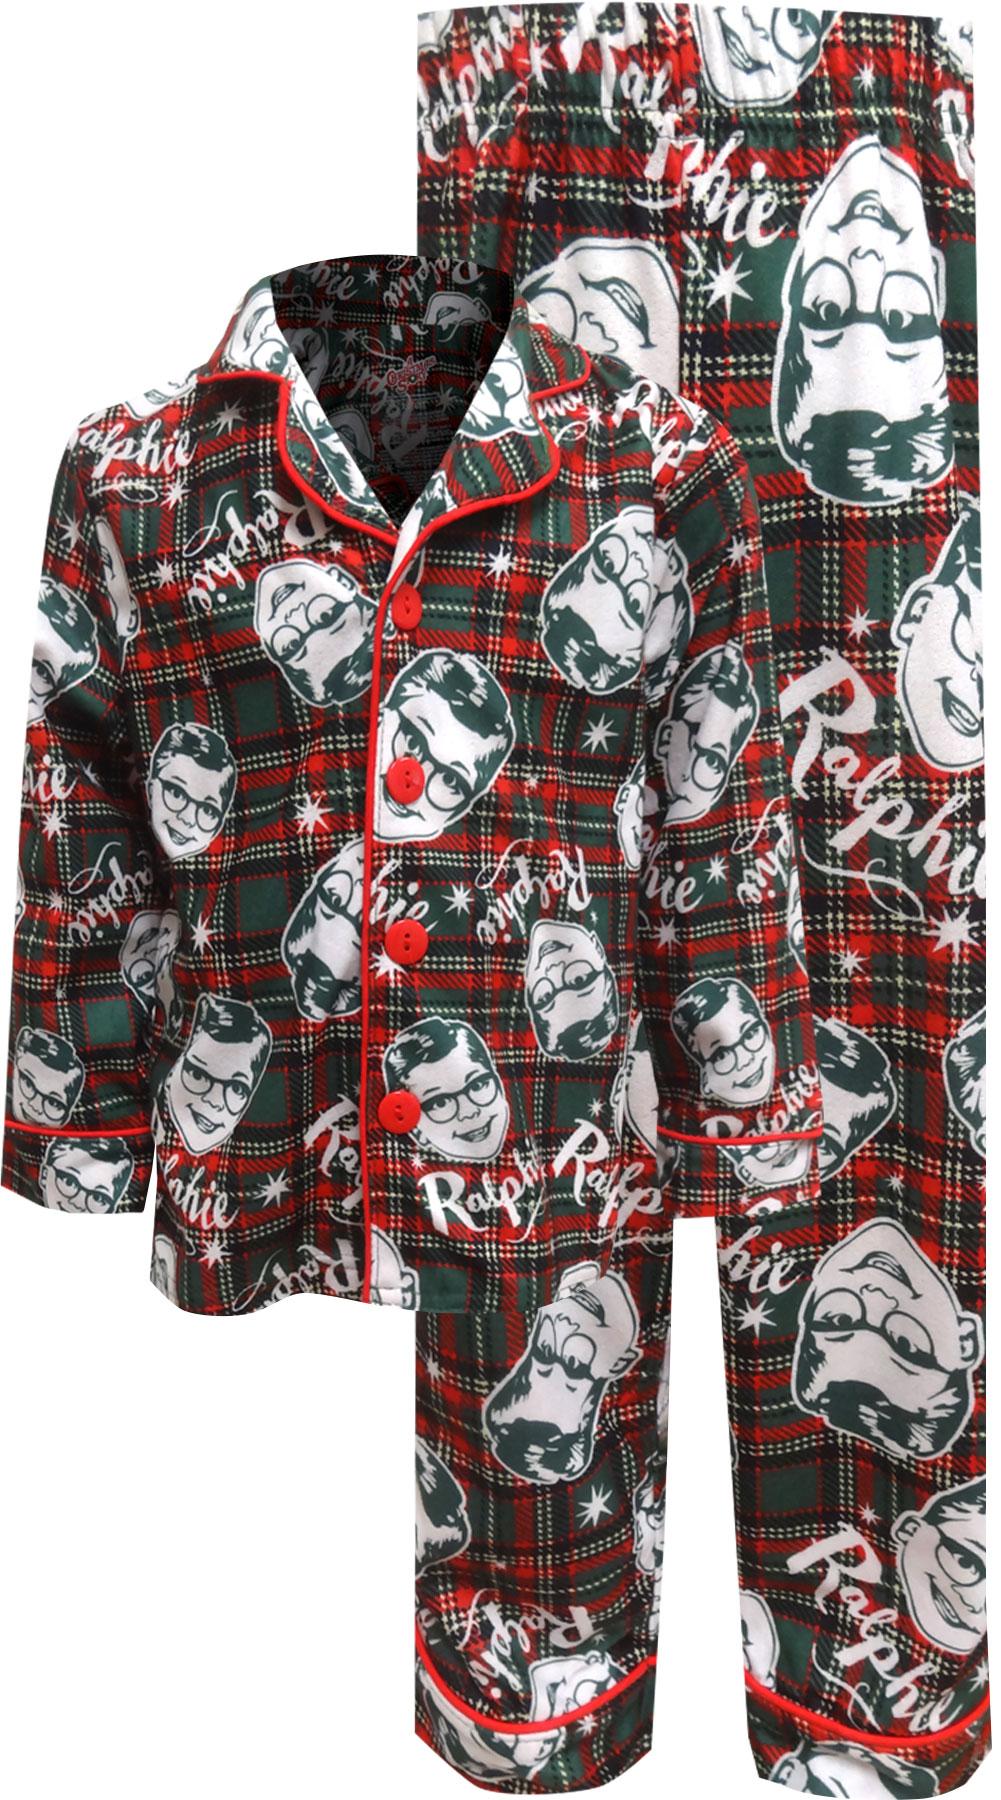 Image of Christmas Story Ralphie Plaid Flannel Holiday Kids Pajamas for boys